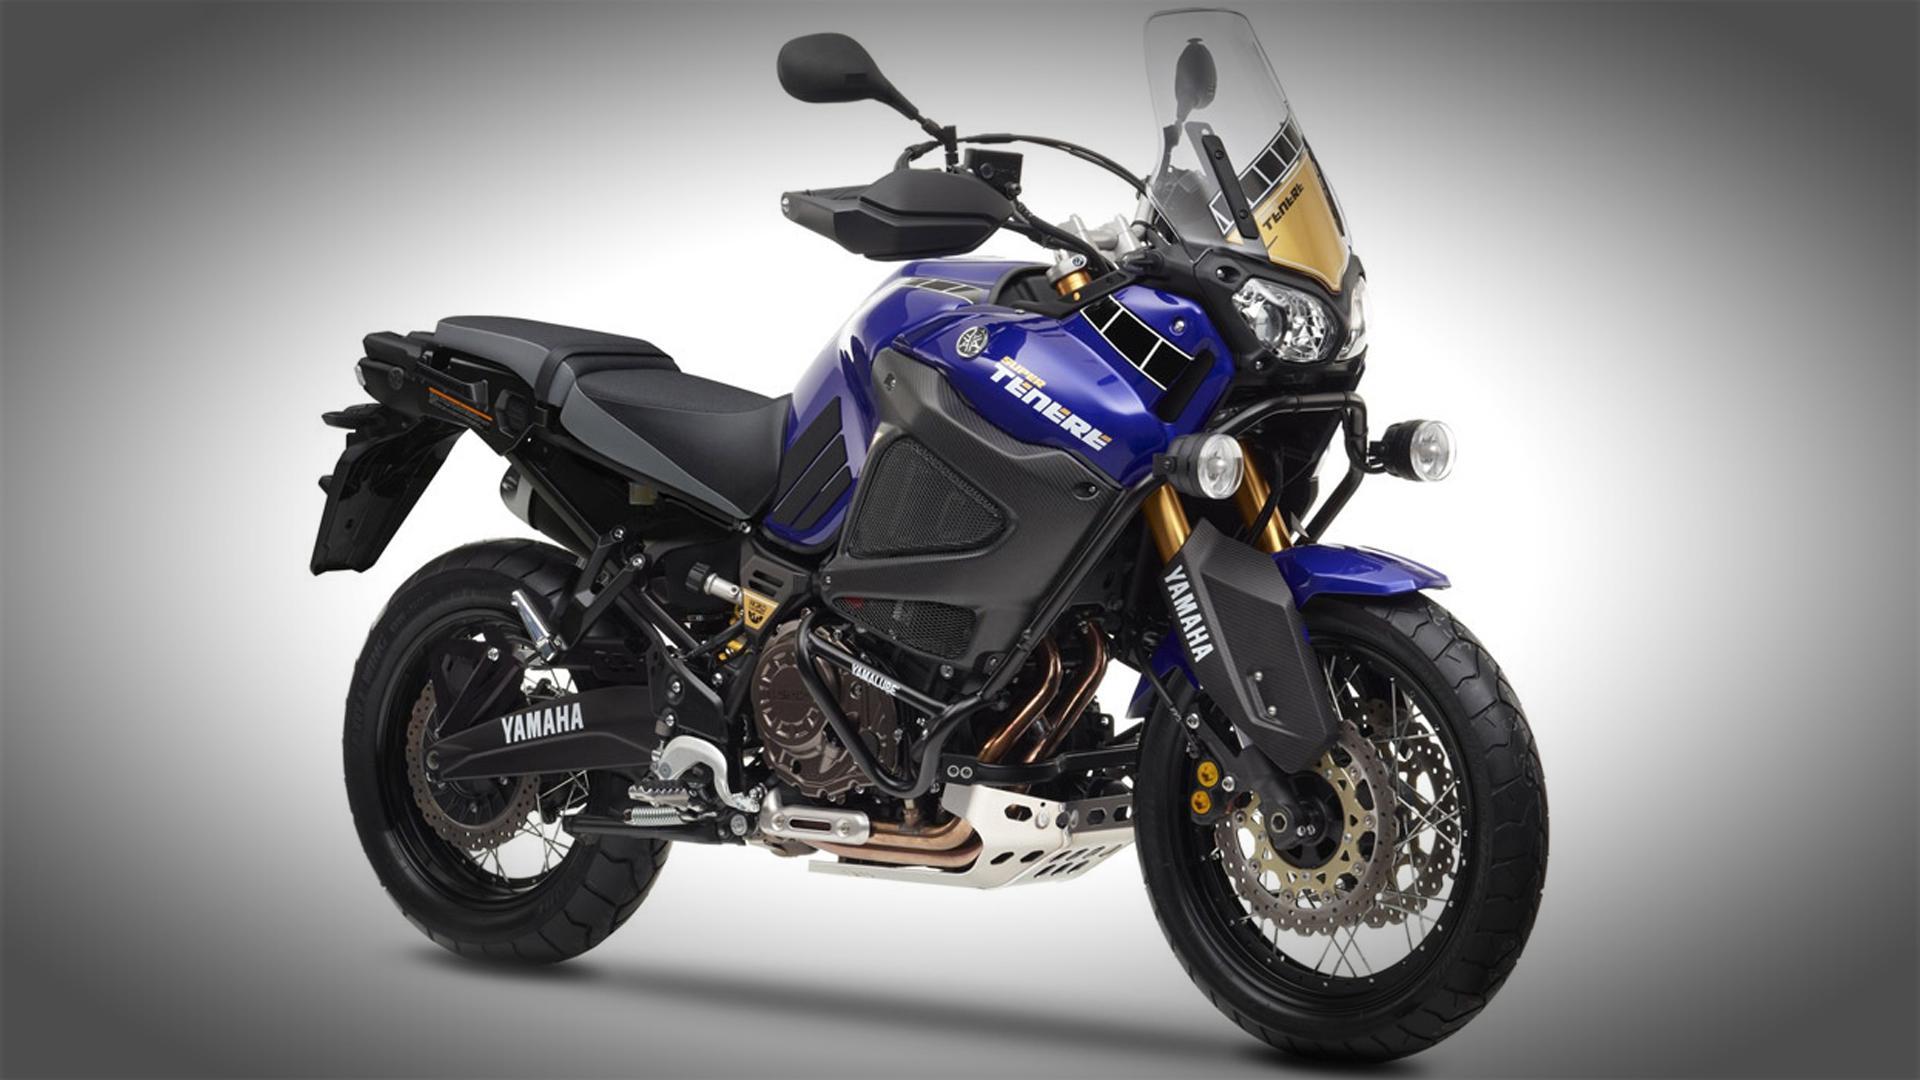 Yamaha Super Tenere For Sale